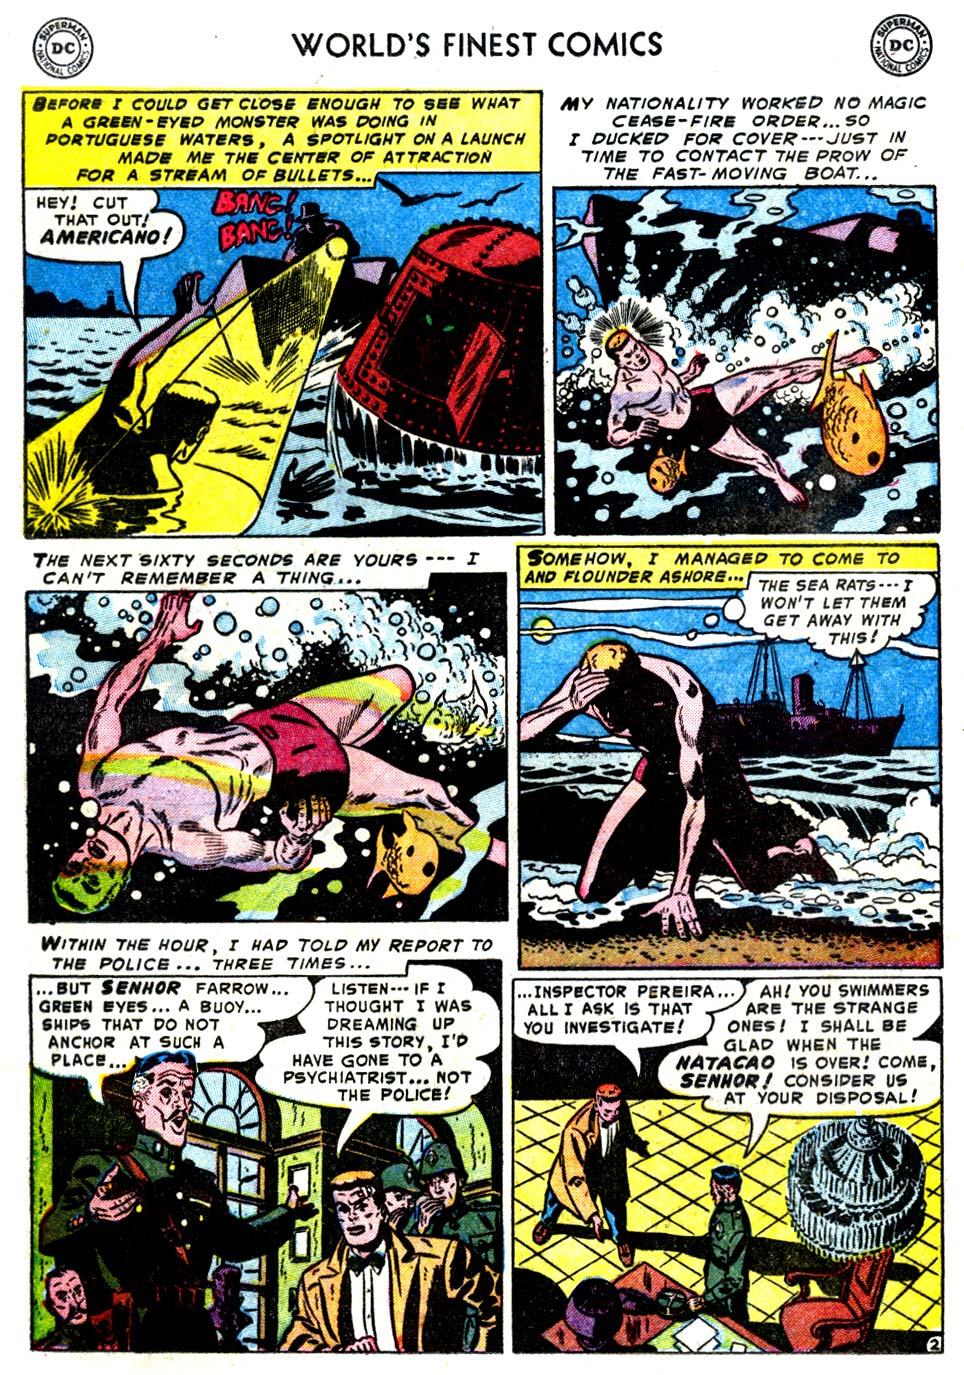 Read online World's Finest Comics comic -  Issue #68 - 44